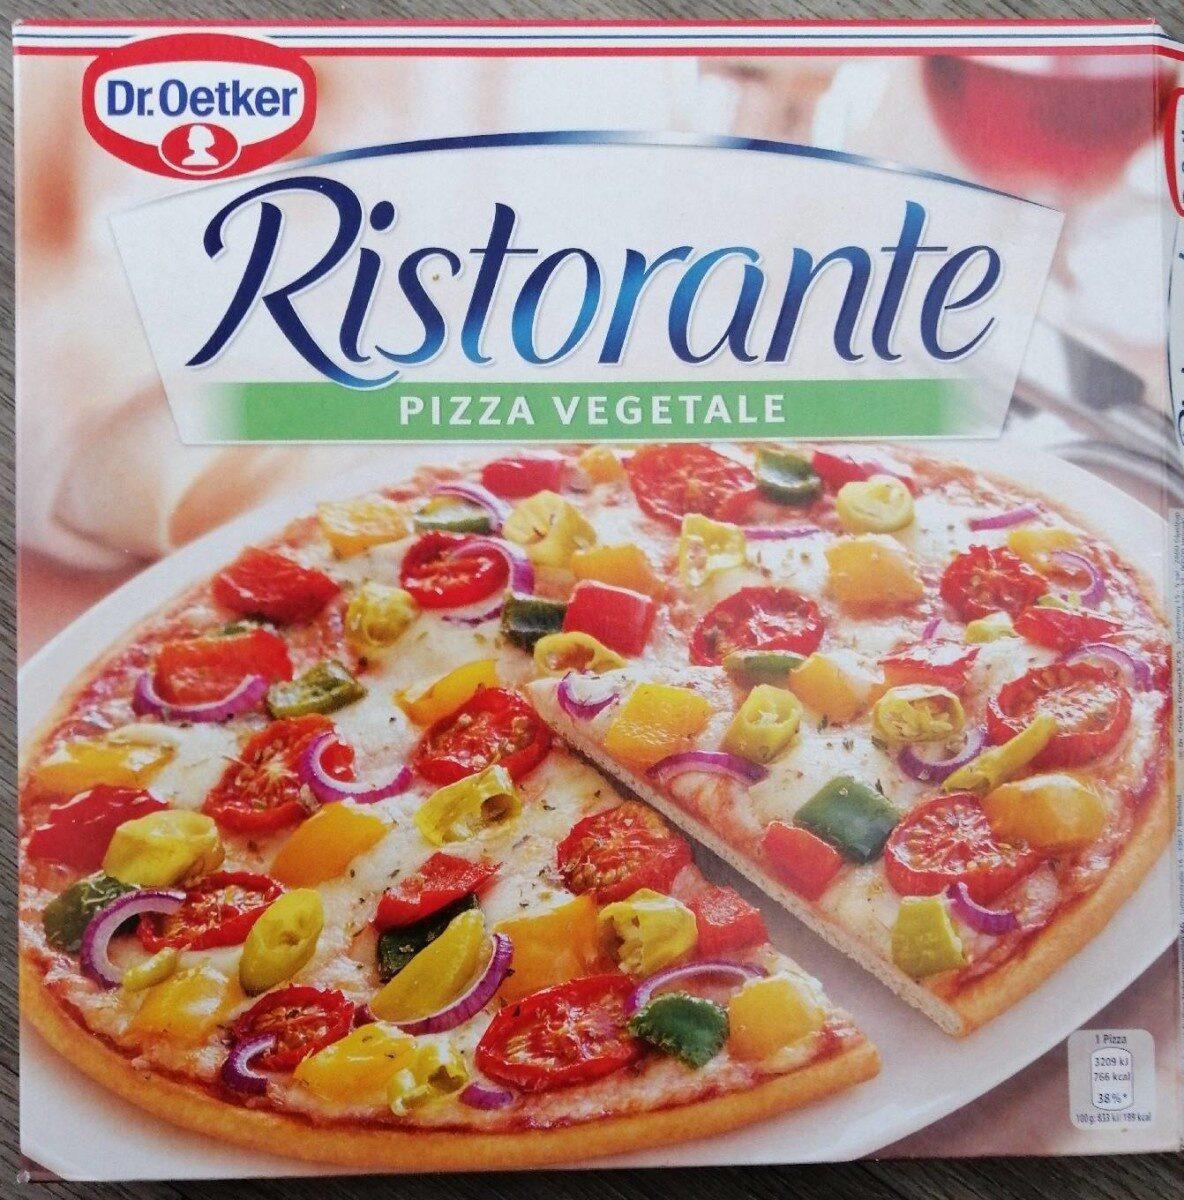 Ristorante pizza végétale - Product